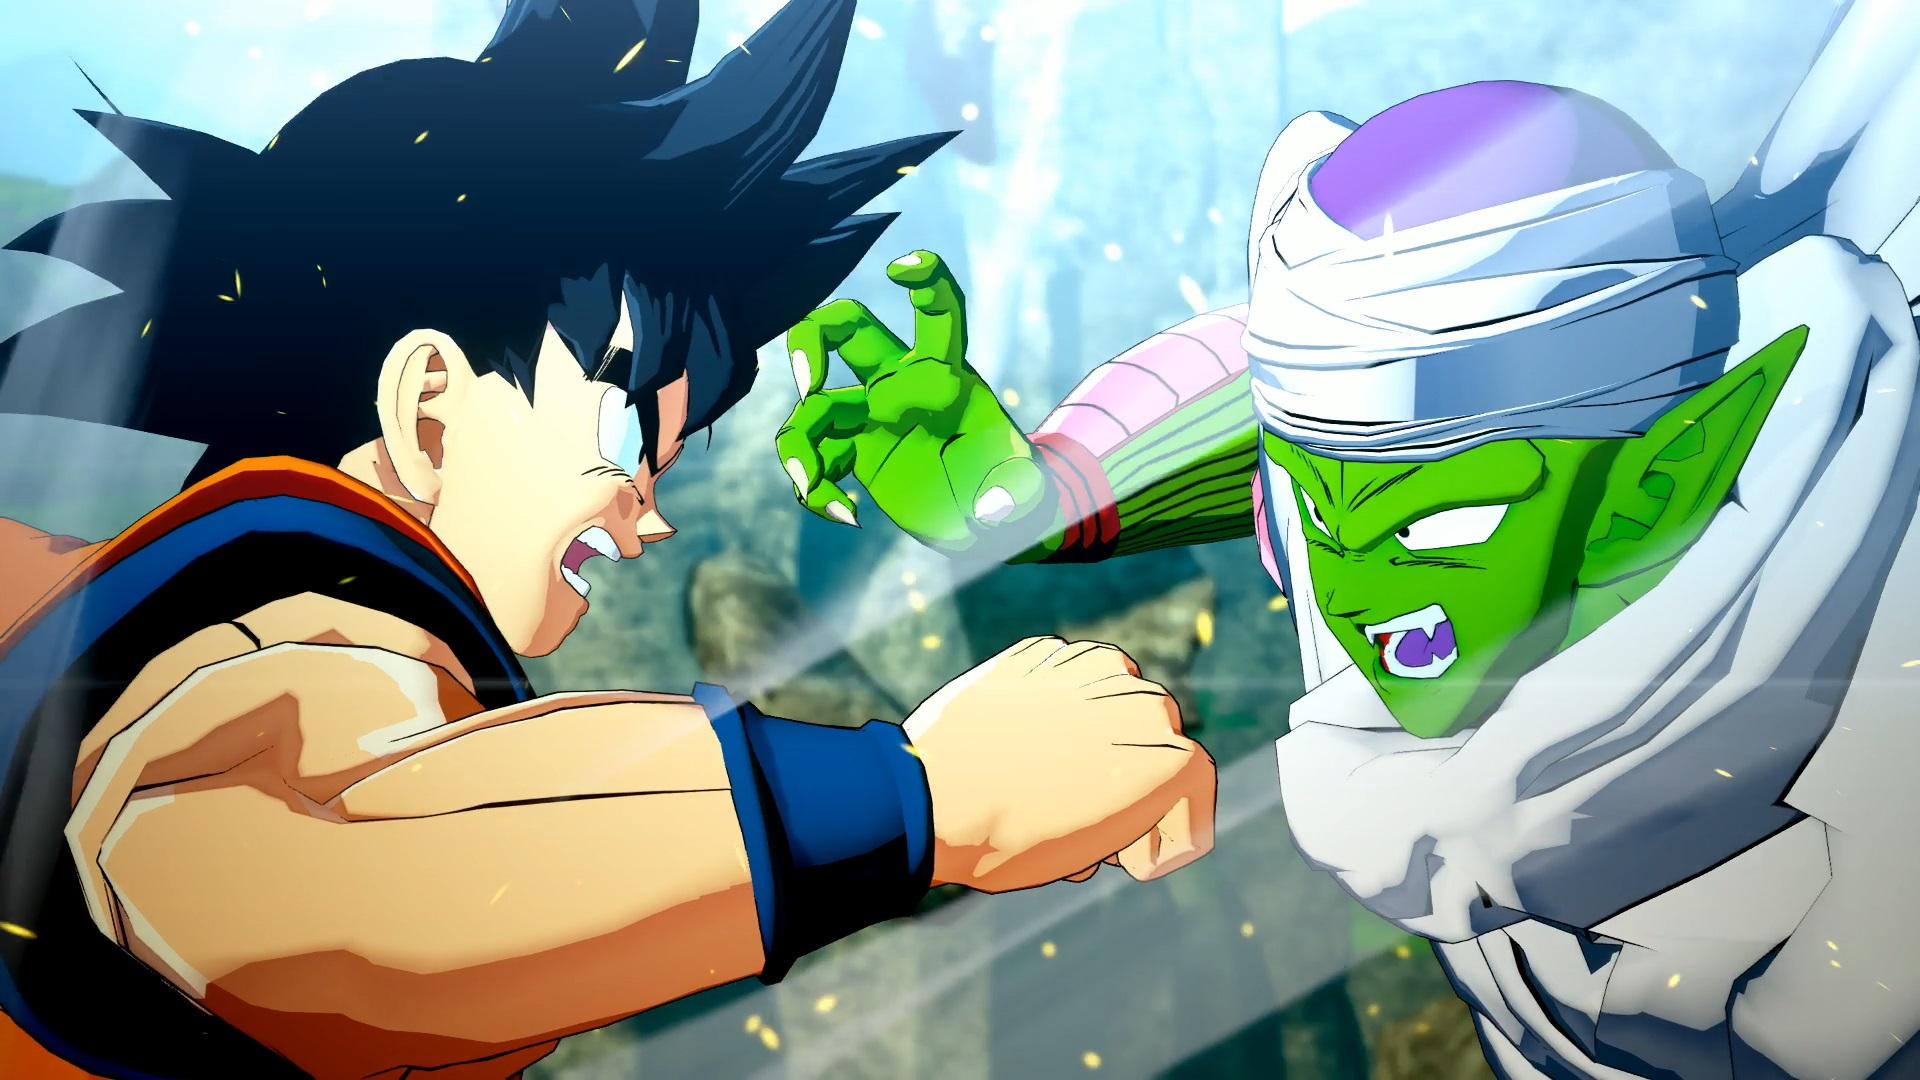 Goku fights Piccolo in Dragon Ball Z: Kakarot